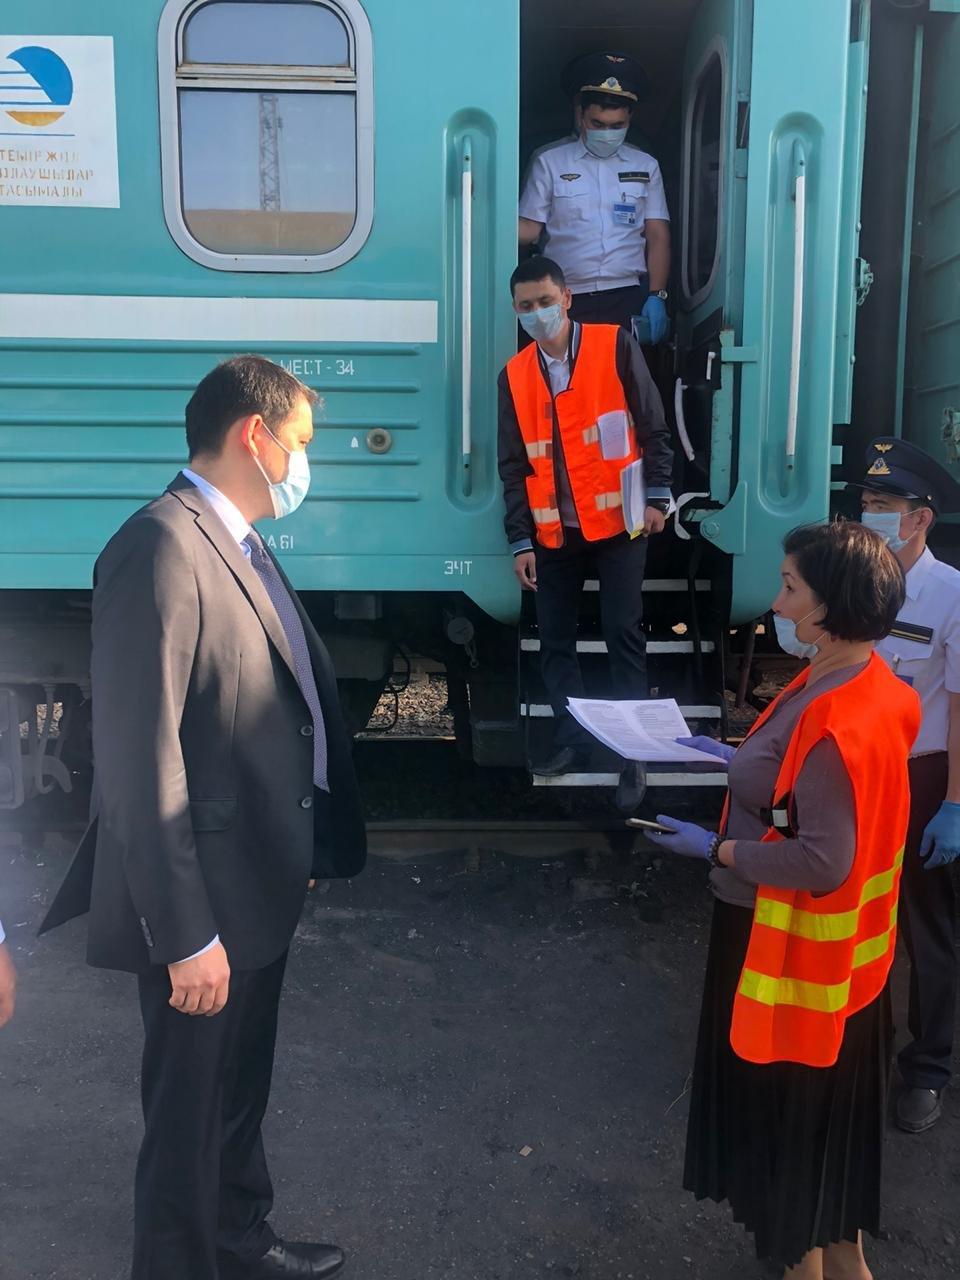 Вокзалы Нур-Султана готовы к запуску пассажирских перевозок , фото-1